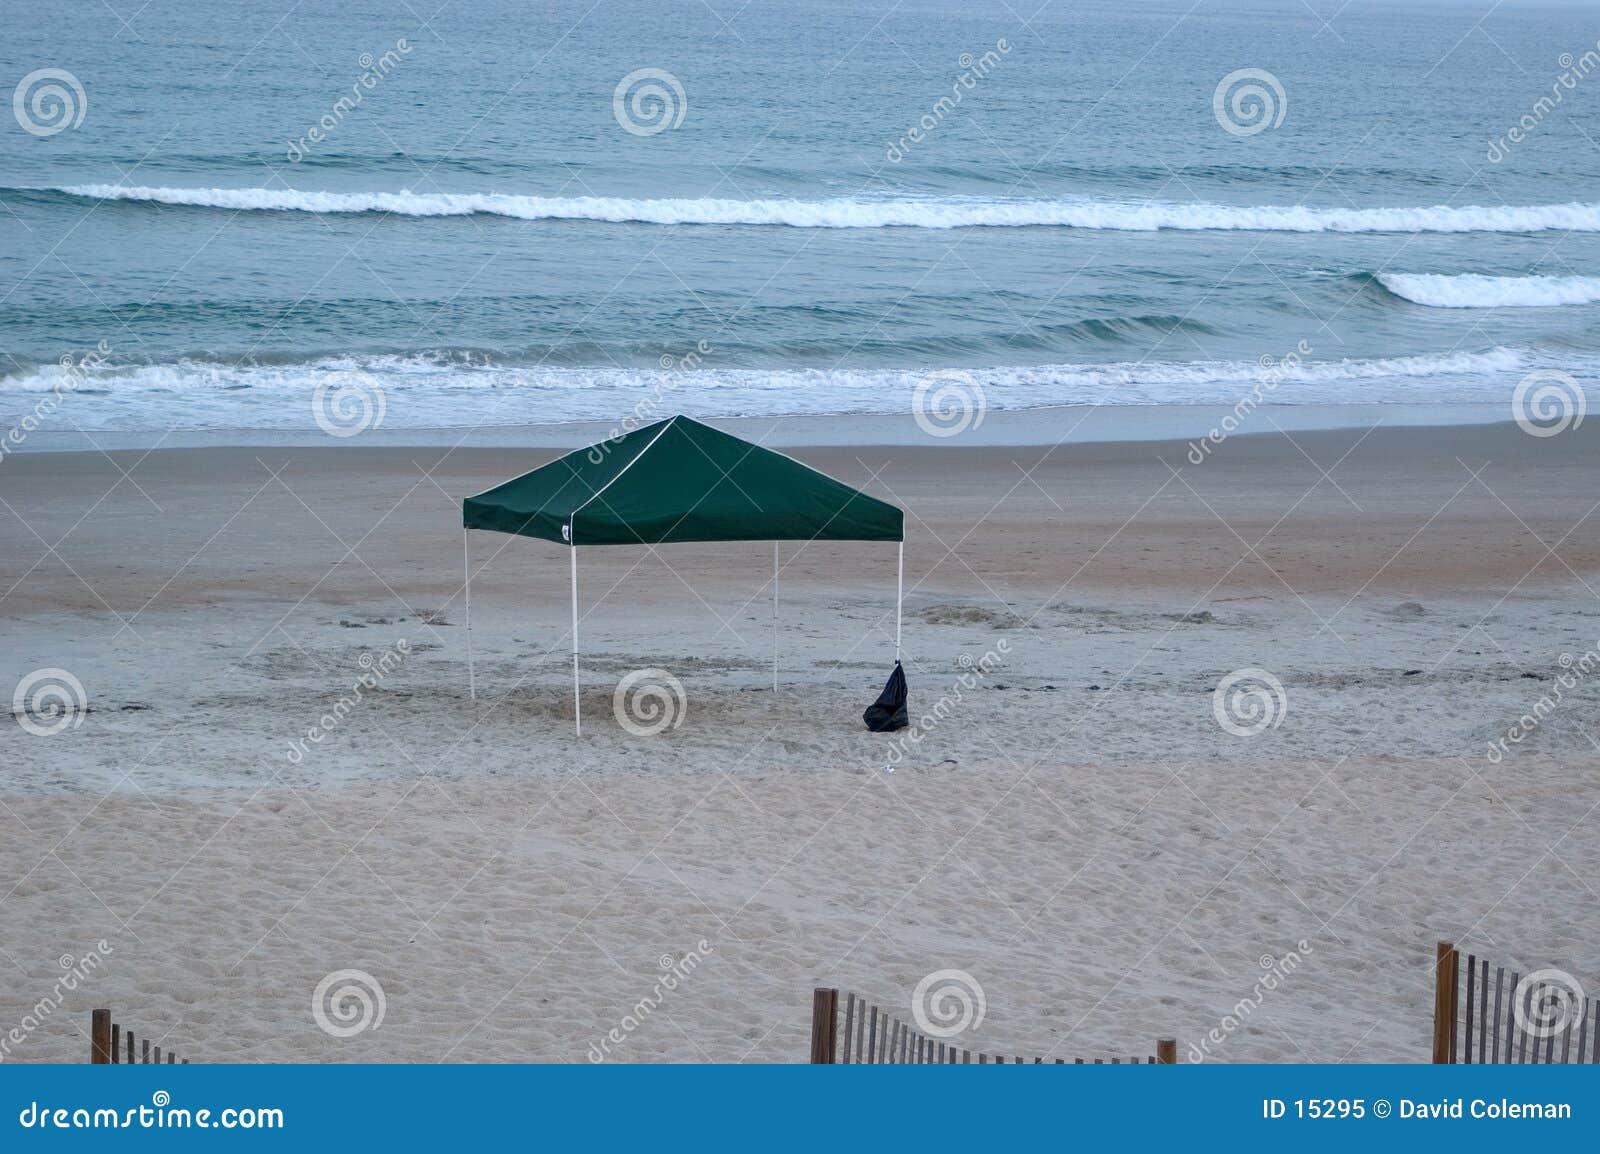 Empty Canopy on the Beach